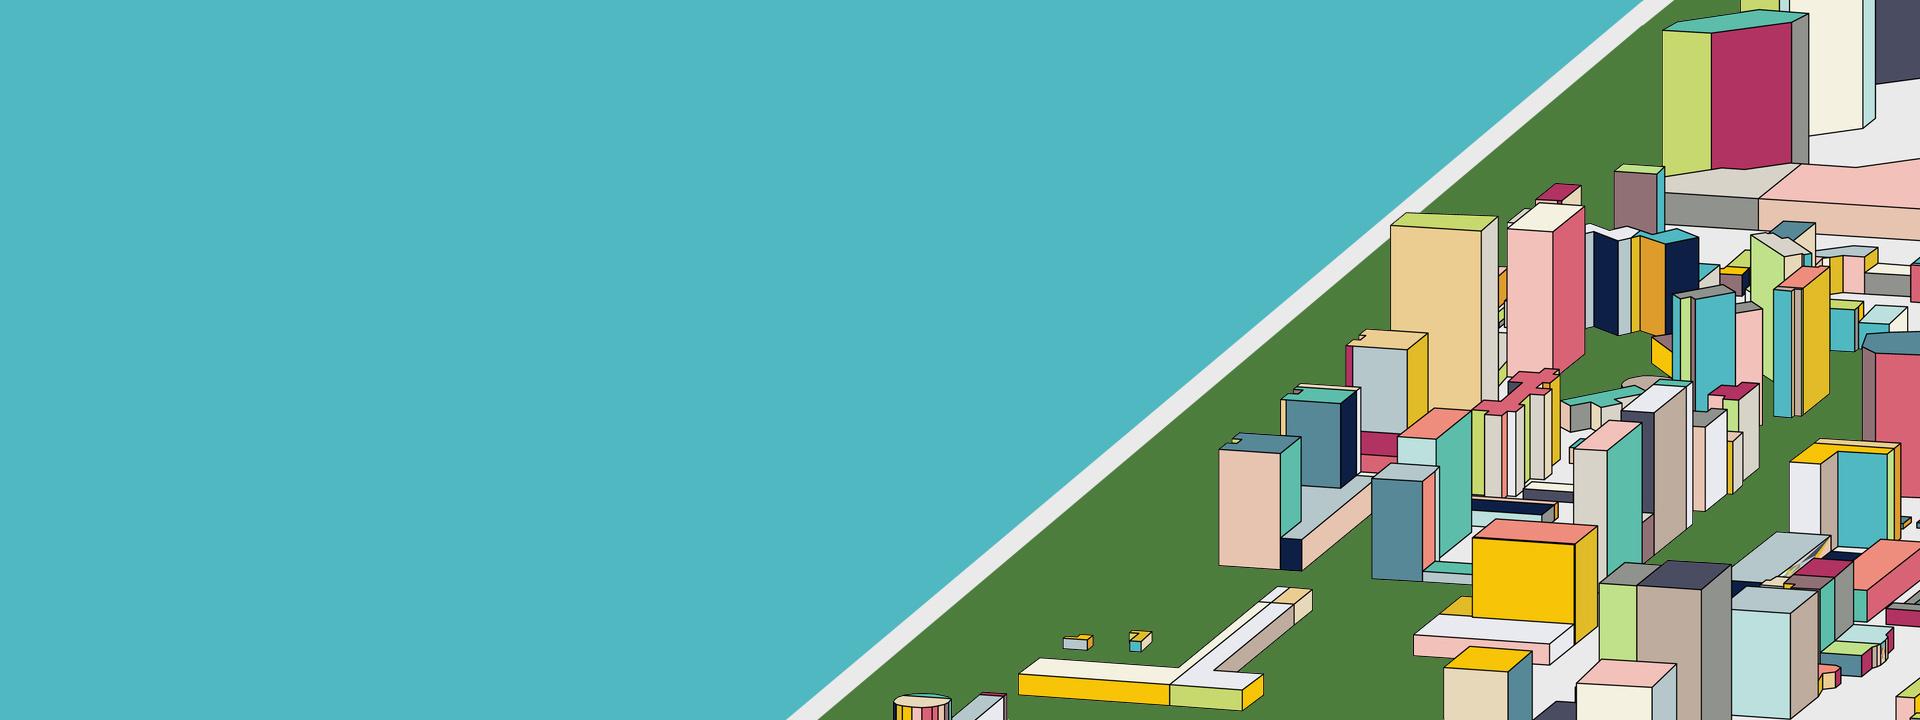 simple geometric illustration of futuristic city